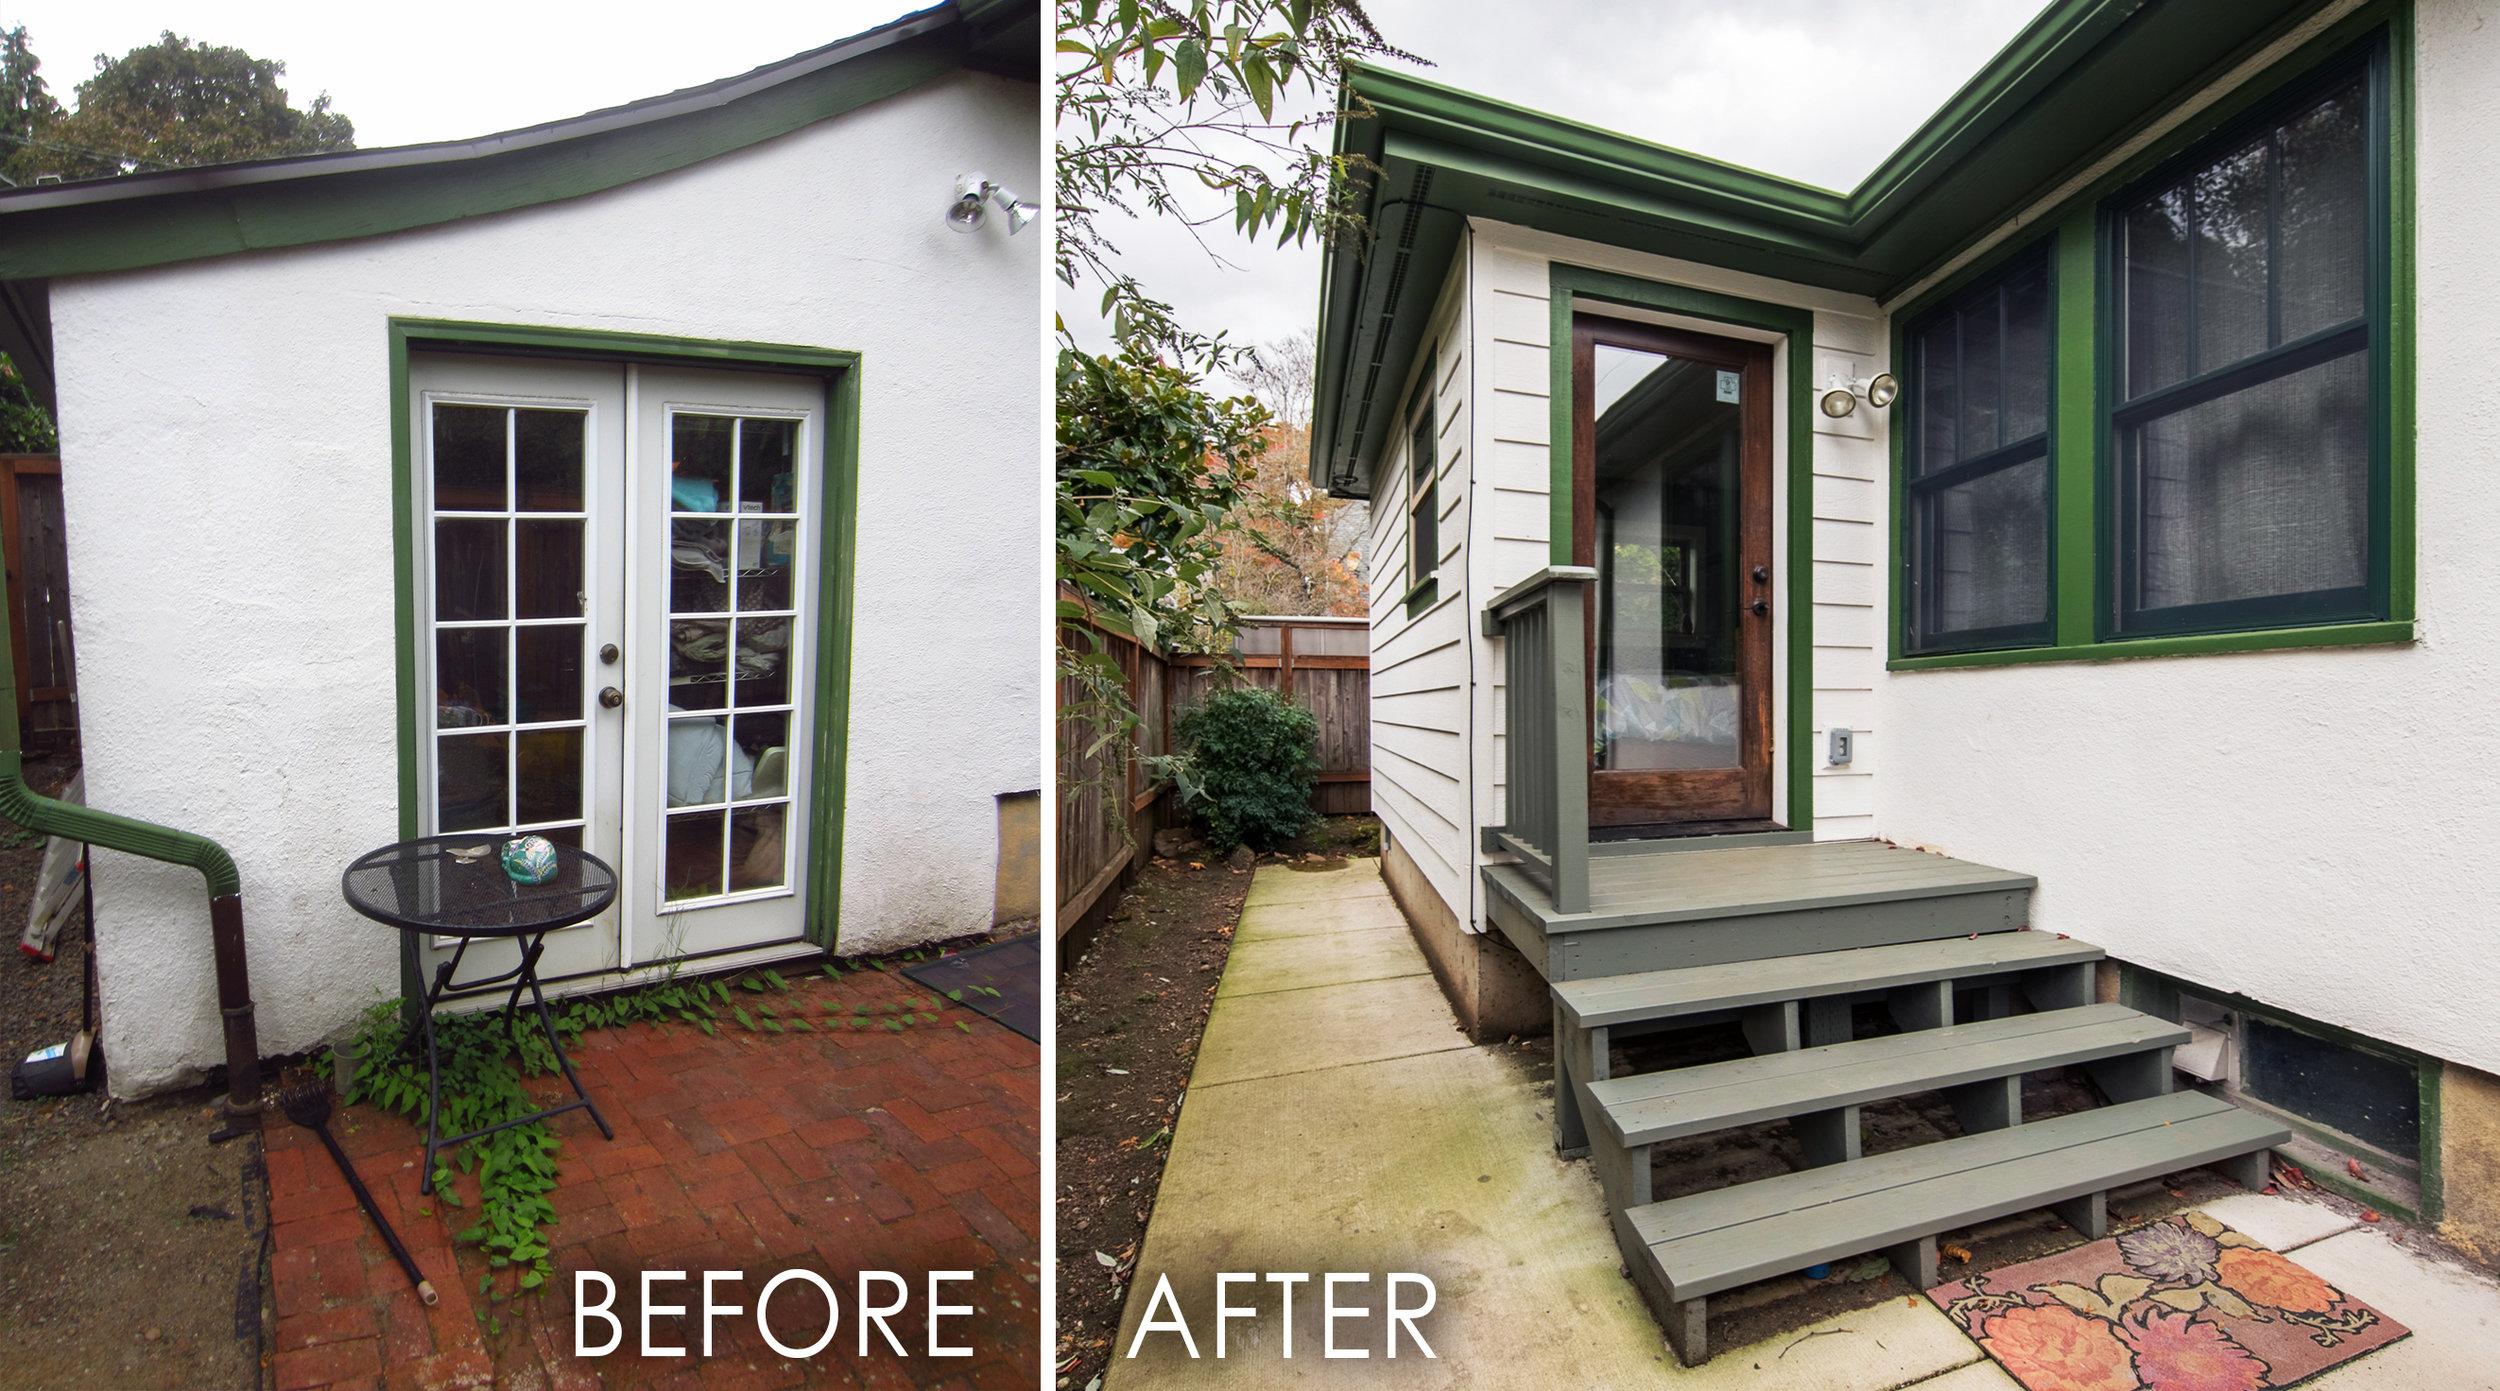 Harka Architecture_Rose City Park Home Remodel (21).jpg